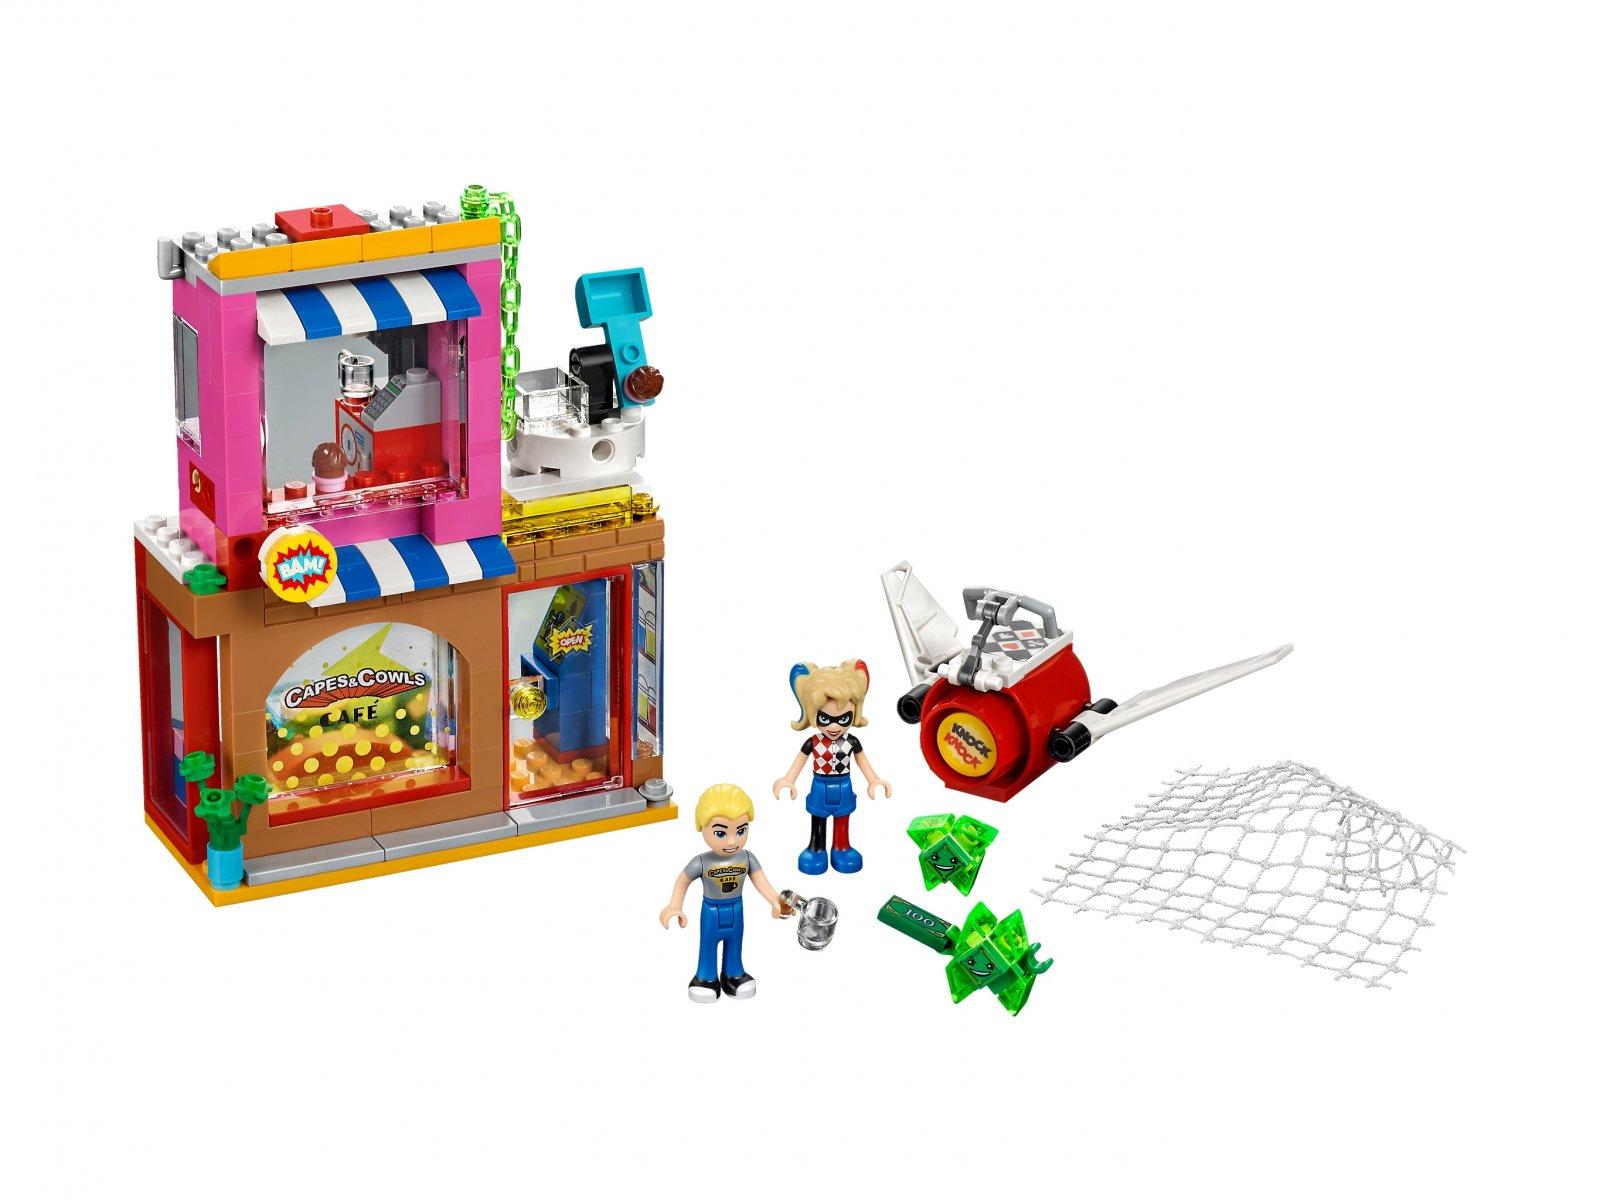 HARLEY QUINN 41231 Lego DC Super Hero Girls MiniFigure New.